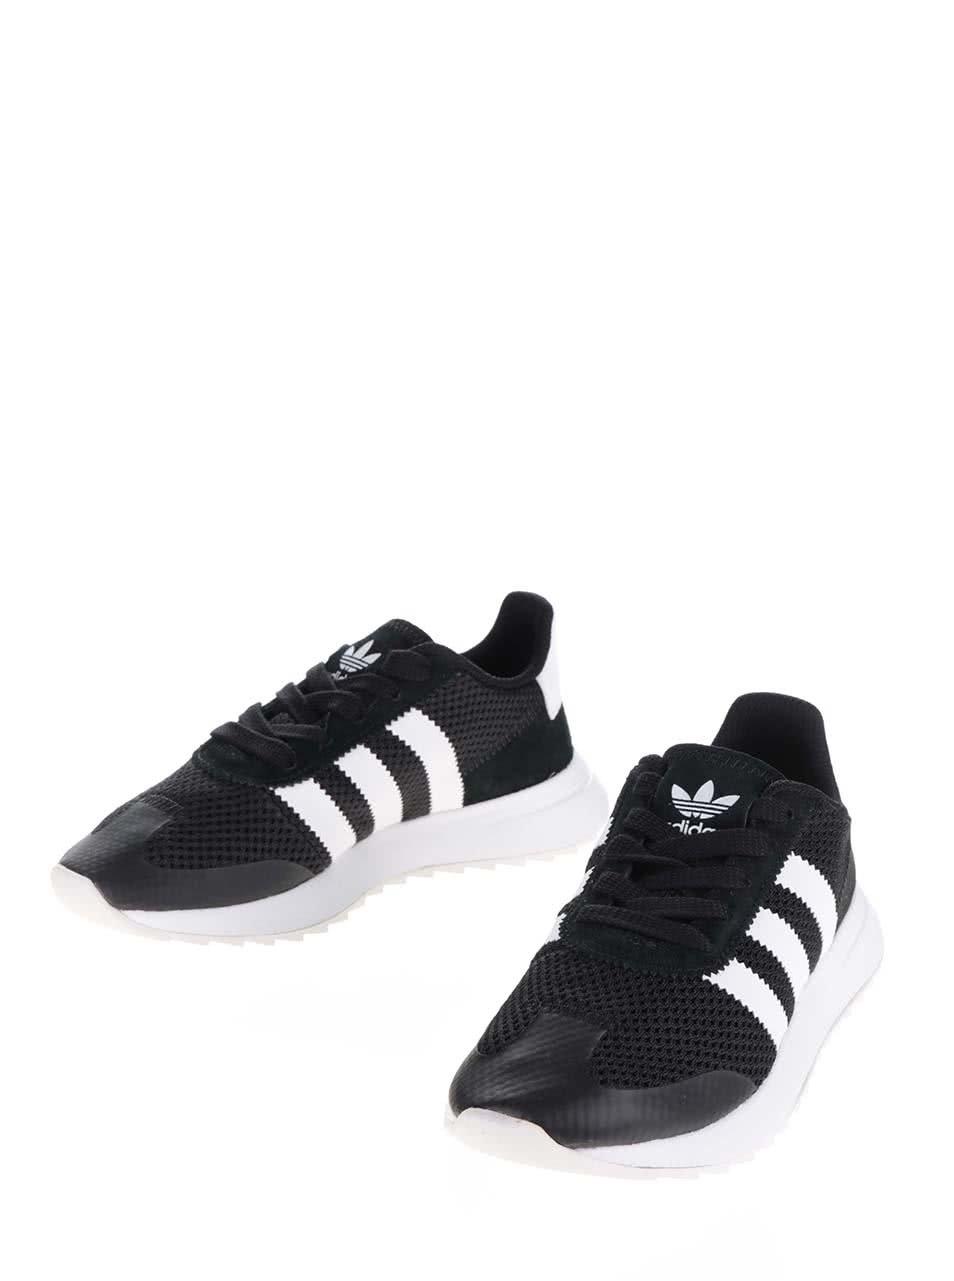 Bílo-černé dámské tenisky adidas Originals Flashback ... f8f592d9354